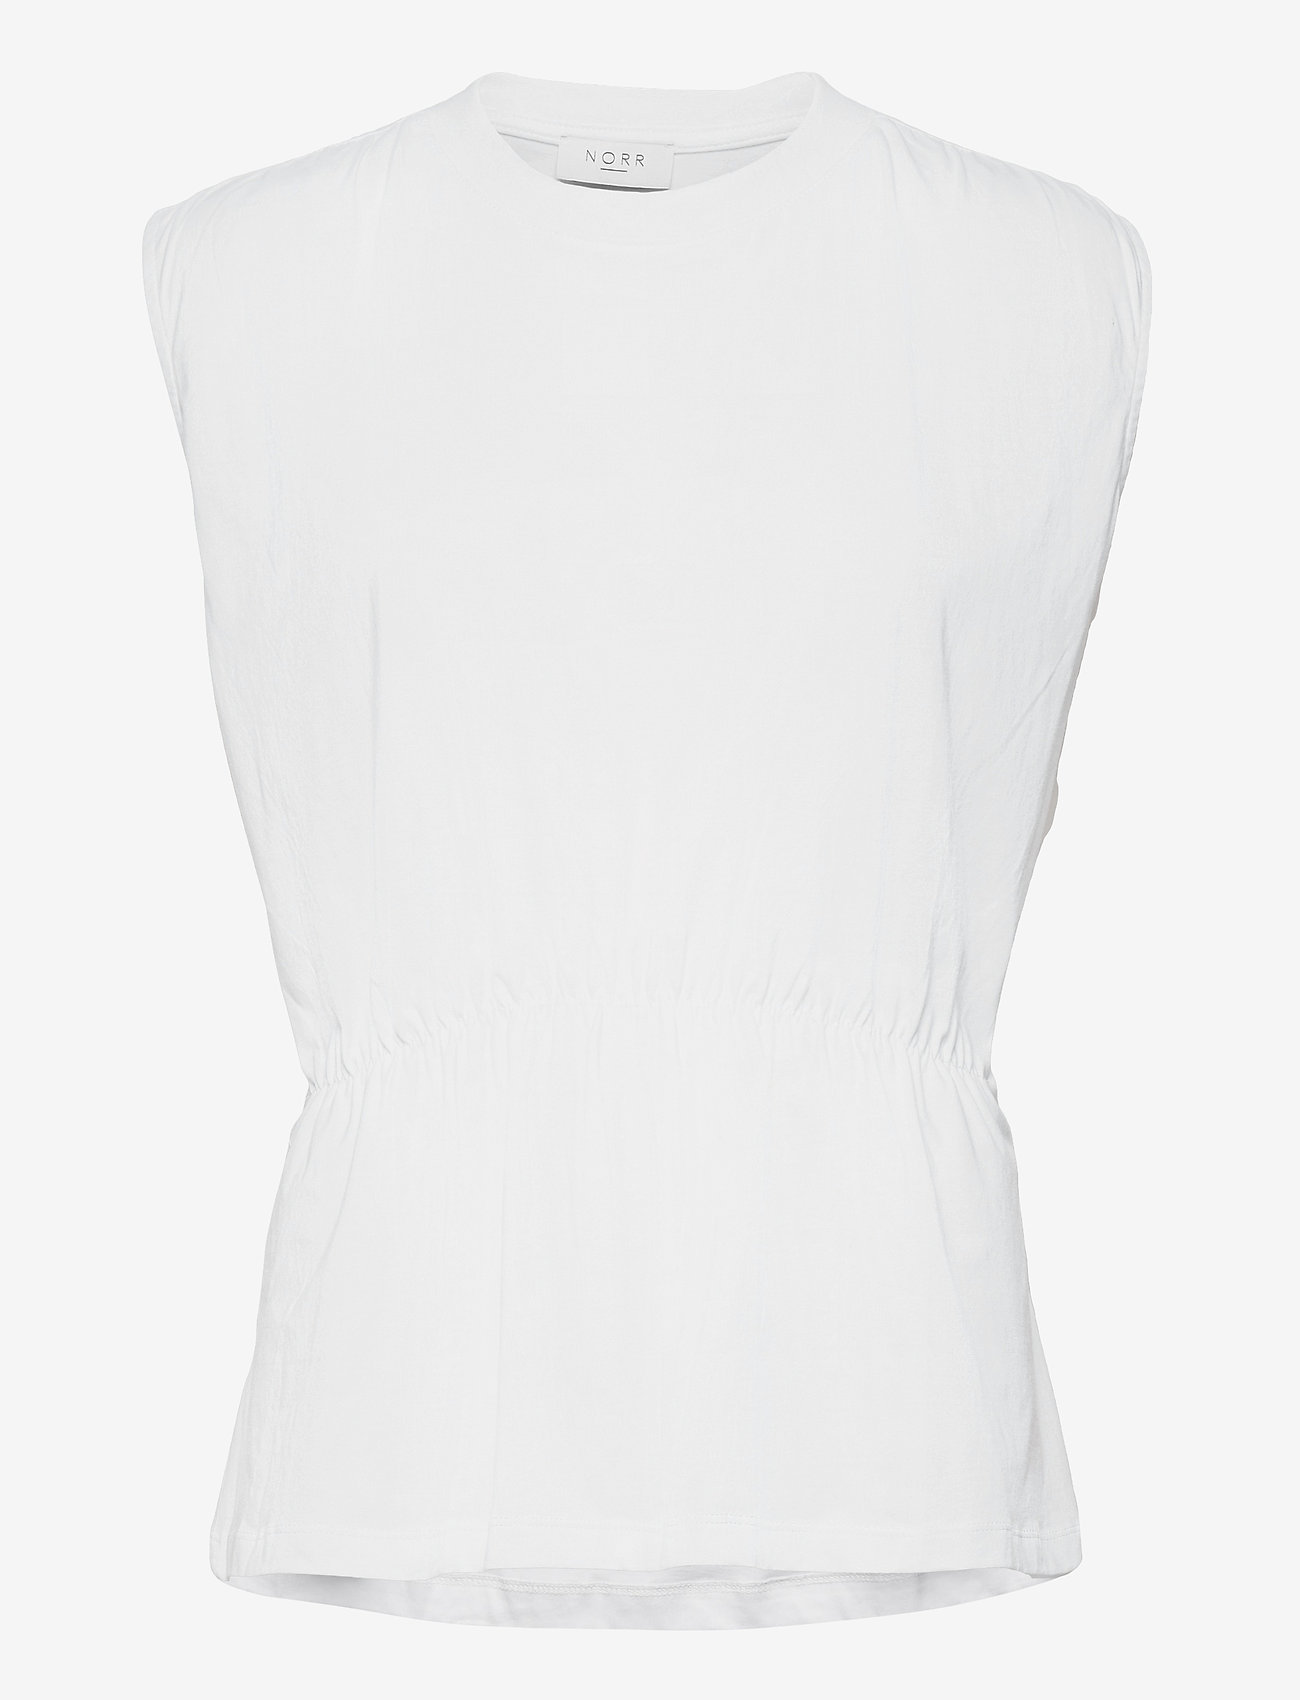 NORR - Augustin top - sleeveless blouses - white - 0